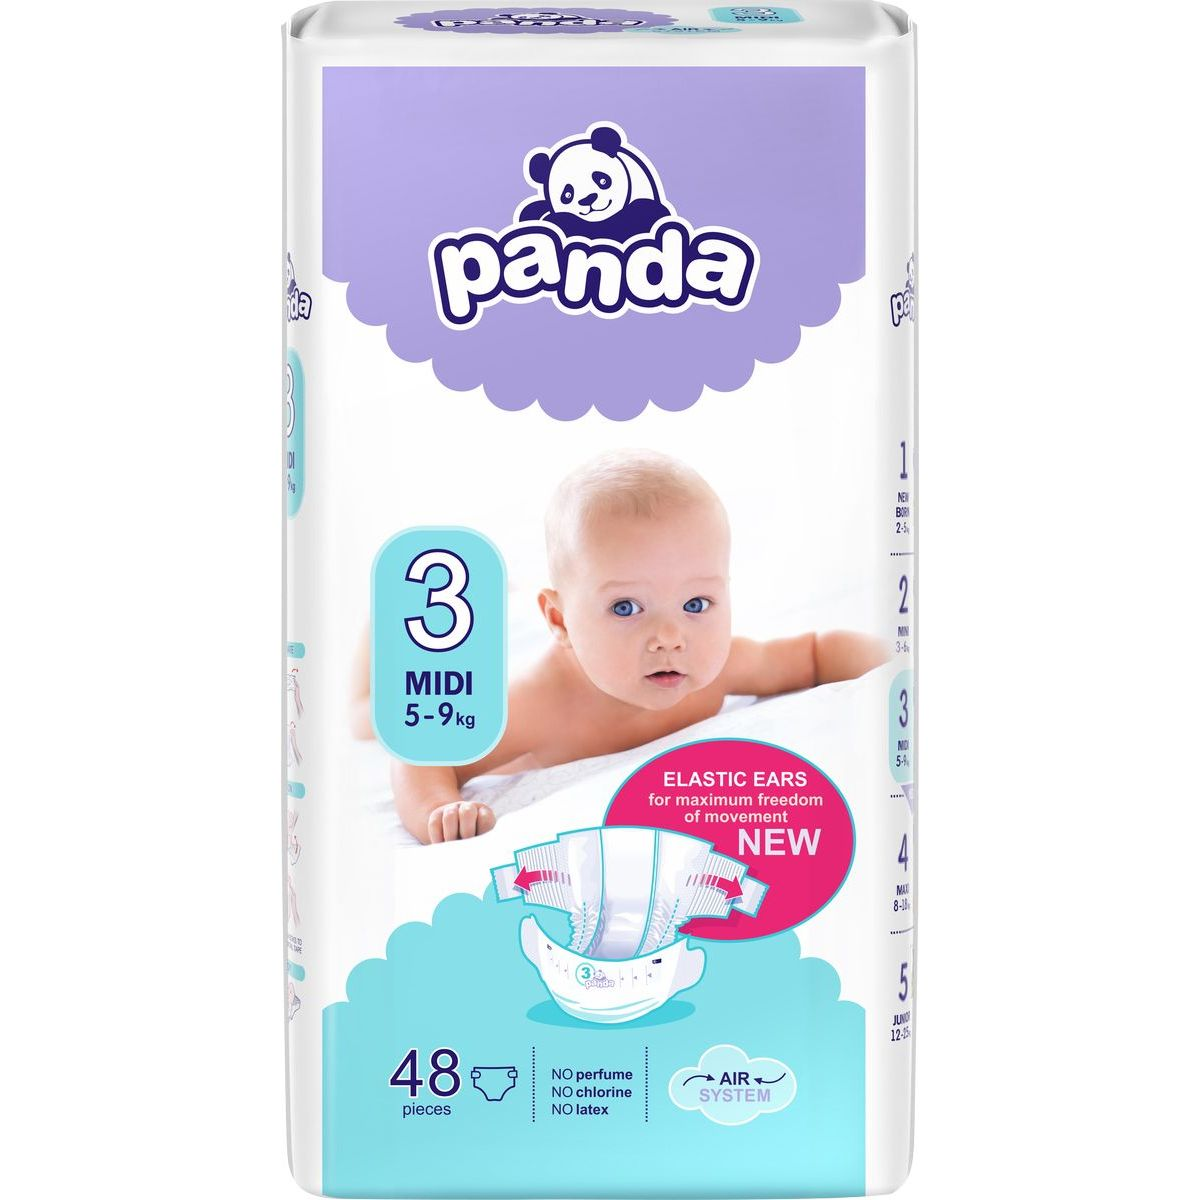 Panda dětské plenky Midi á 48 ks